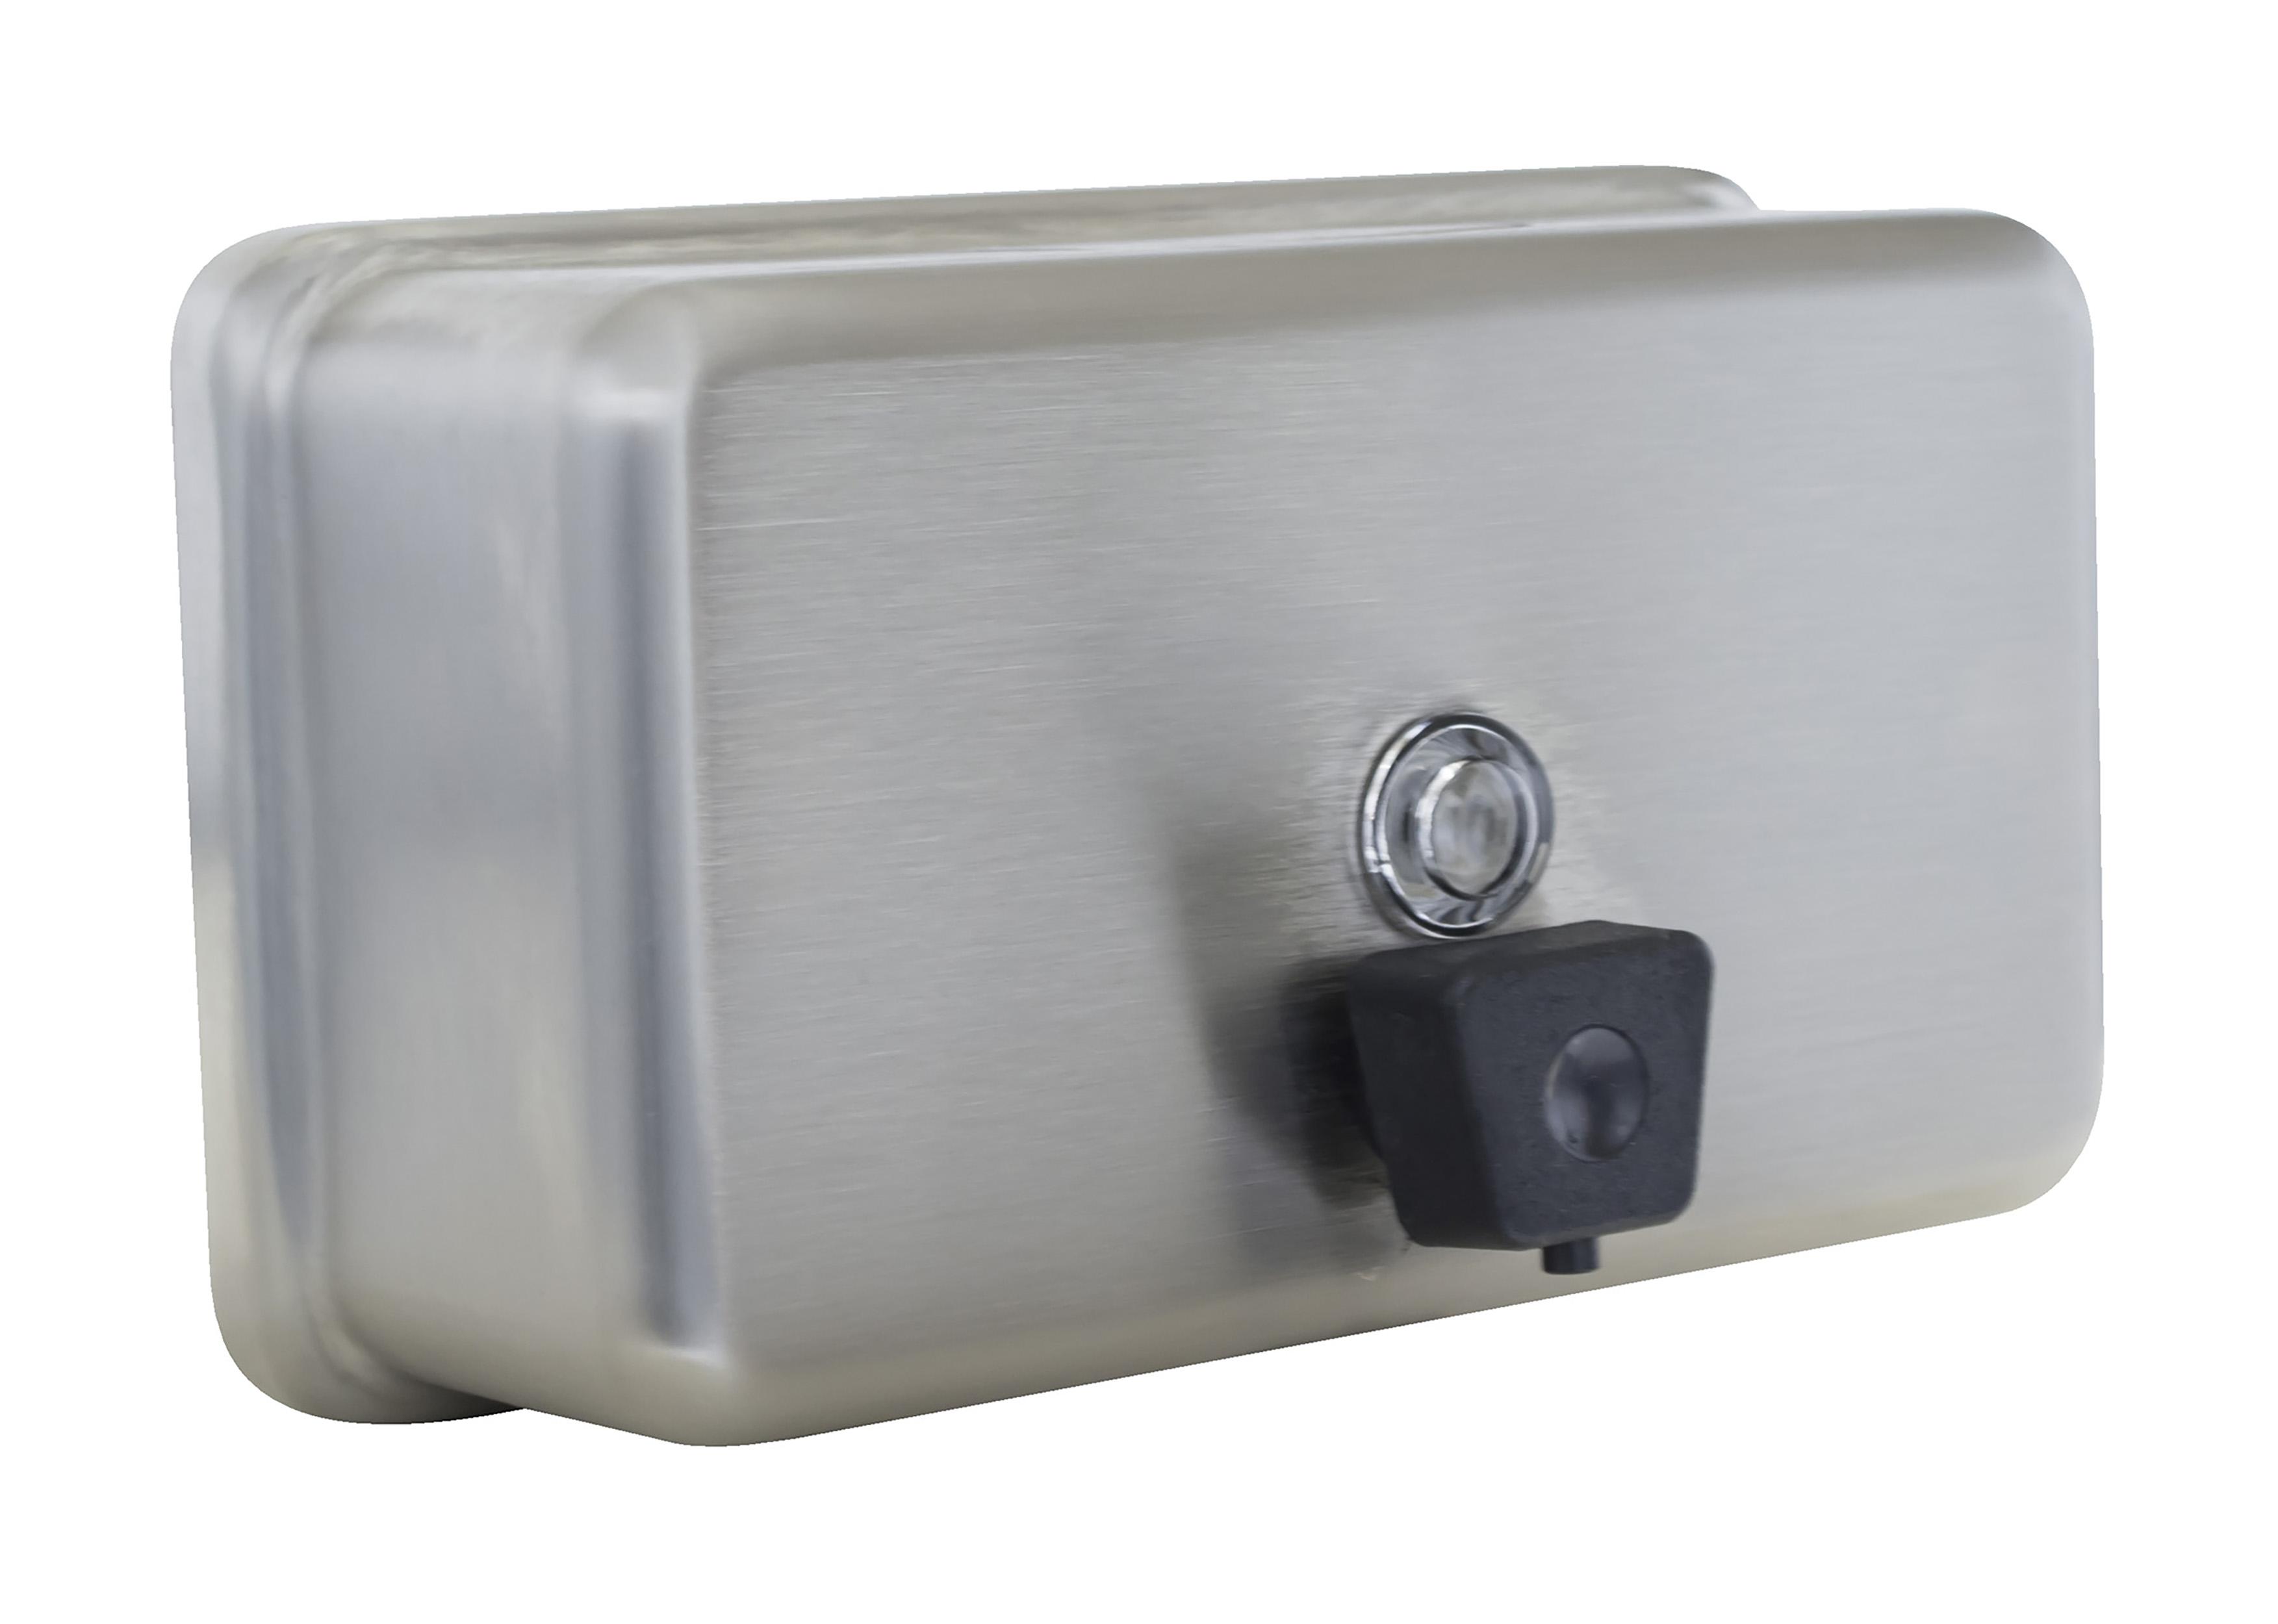 wallmounted horizontal tank soap dispenser